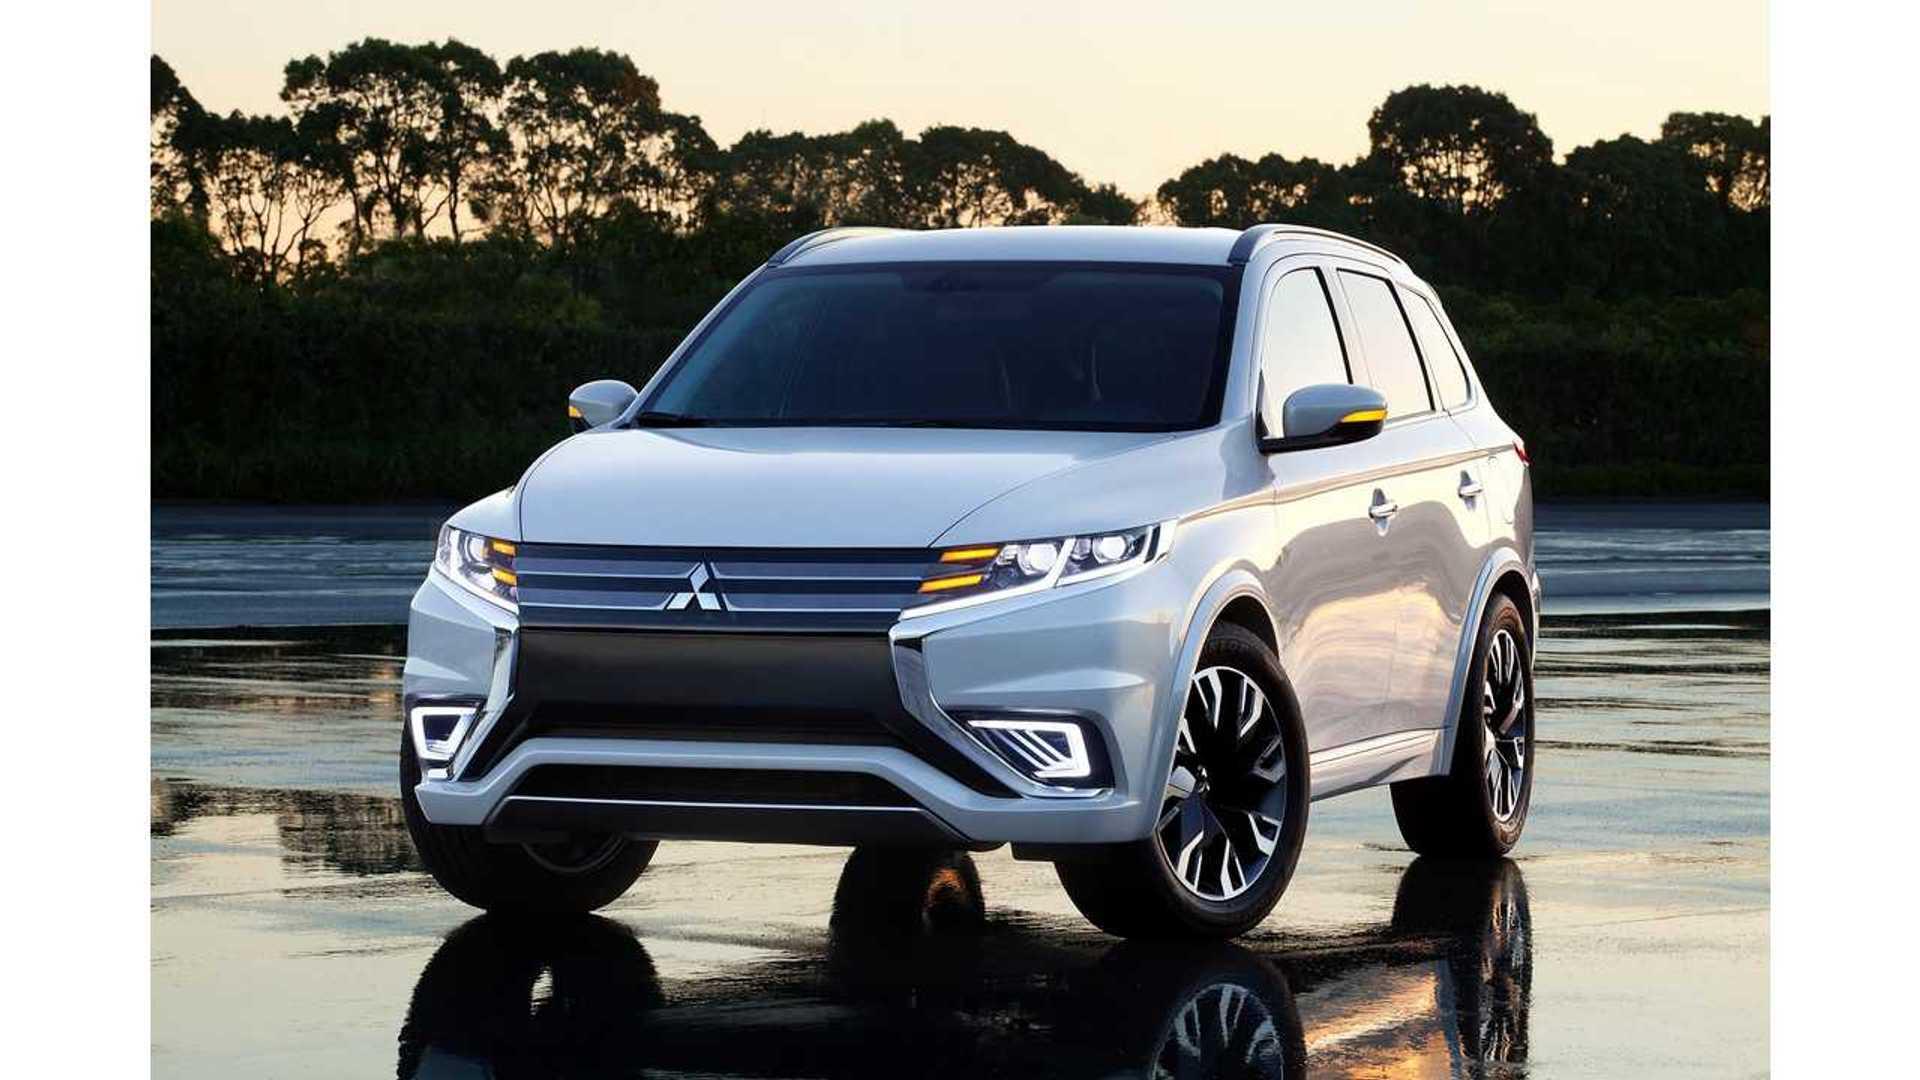 Mitsubishi Electric Car >> Mitsubishi Says Electric Cars Are Key To Its Profits